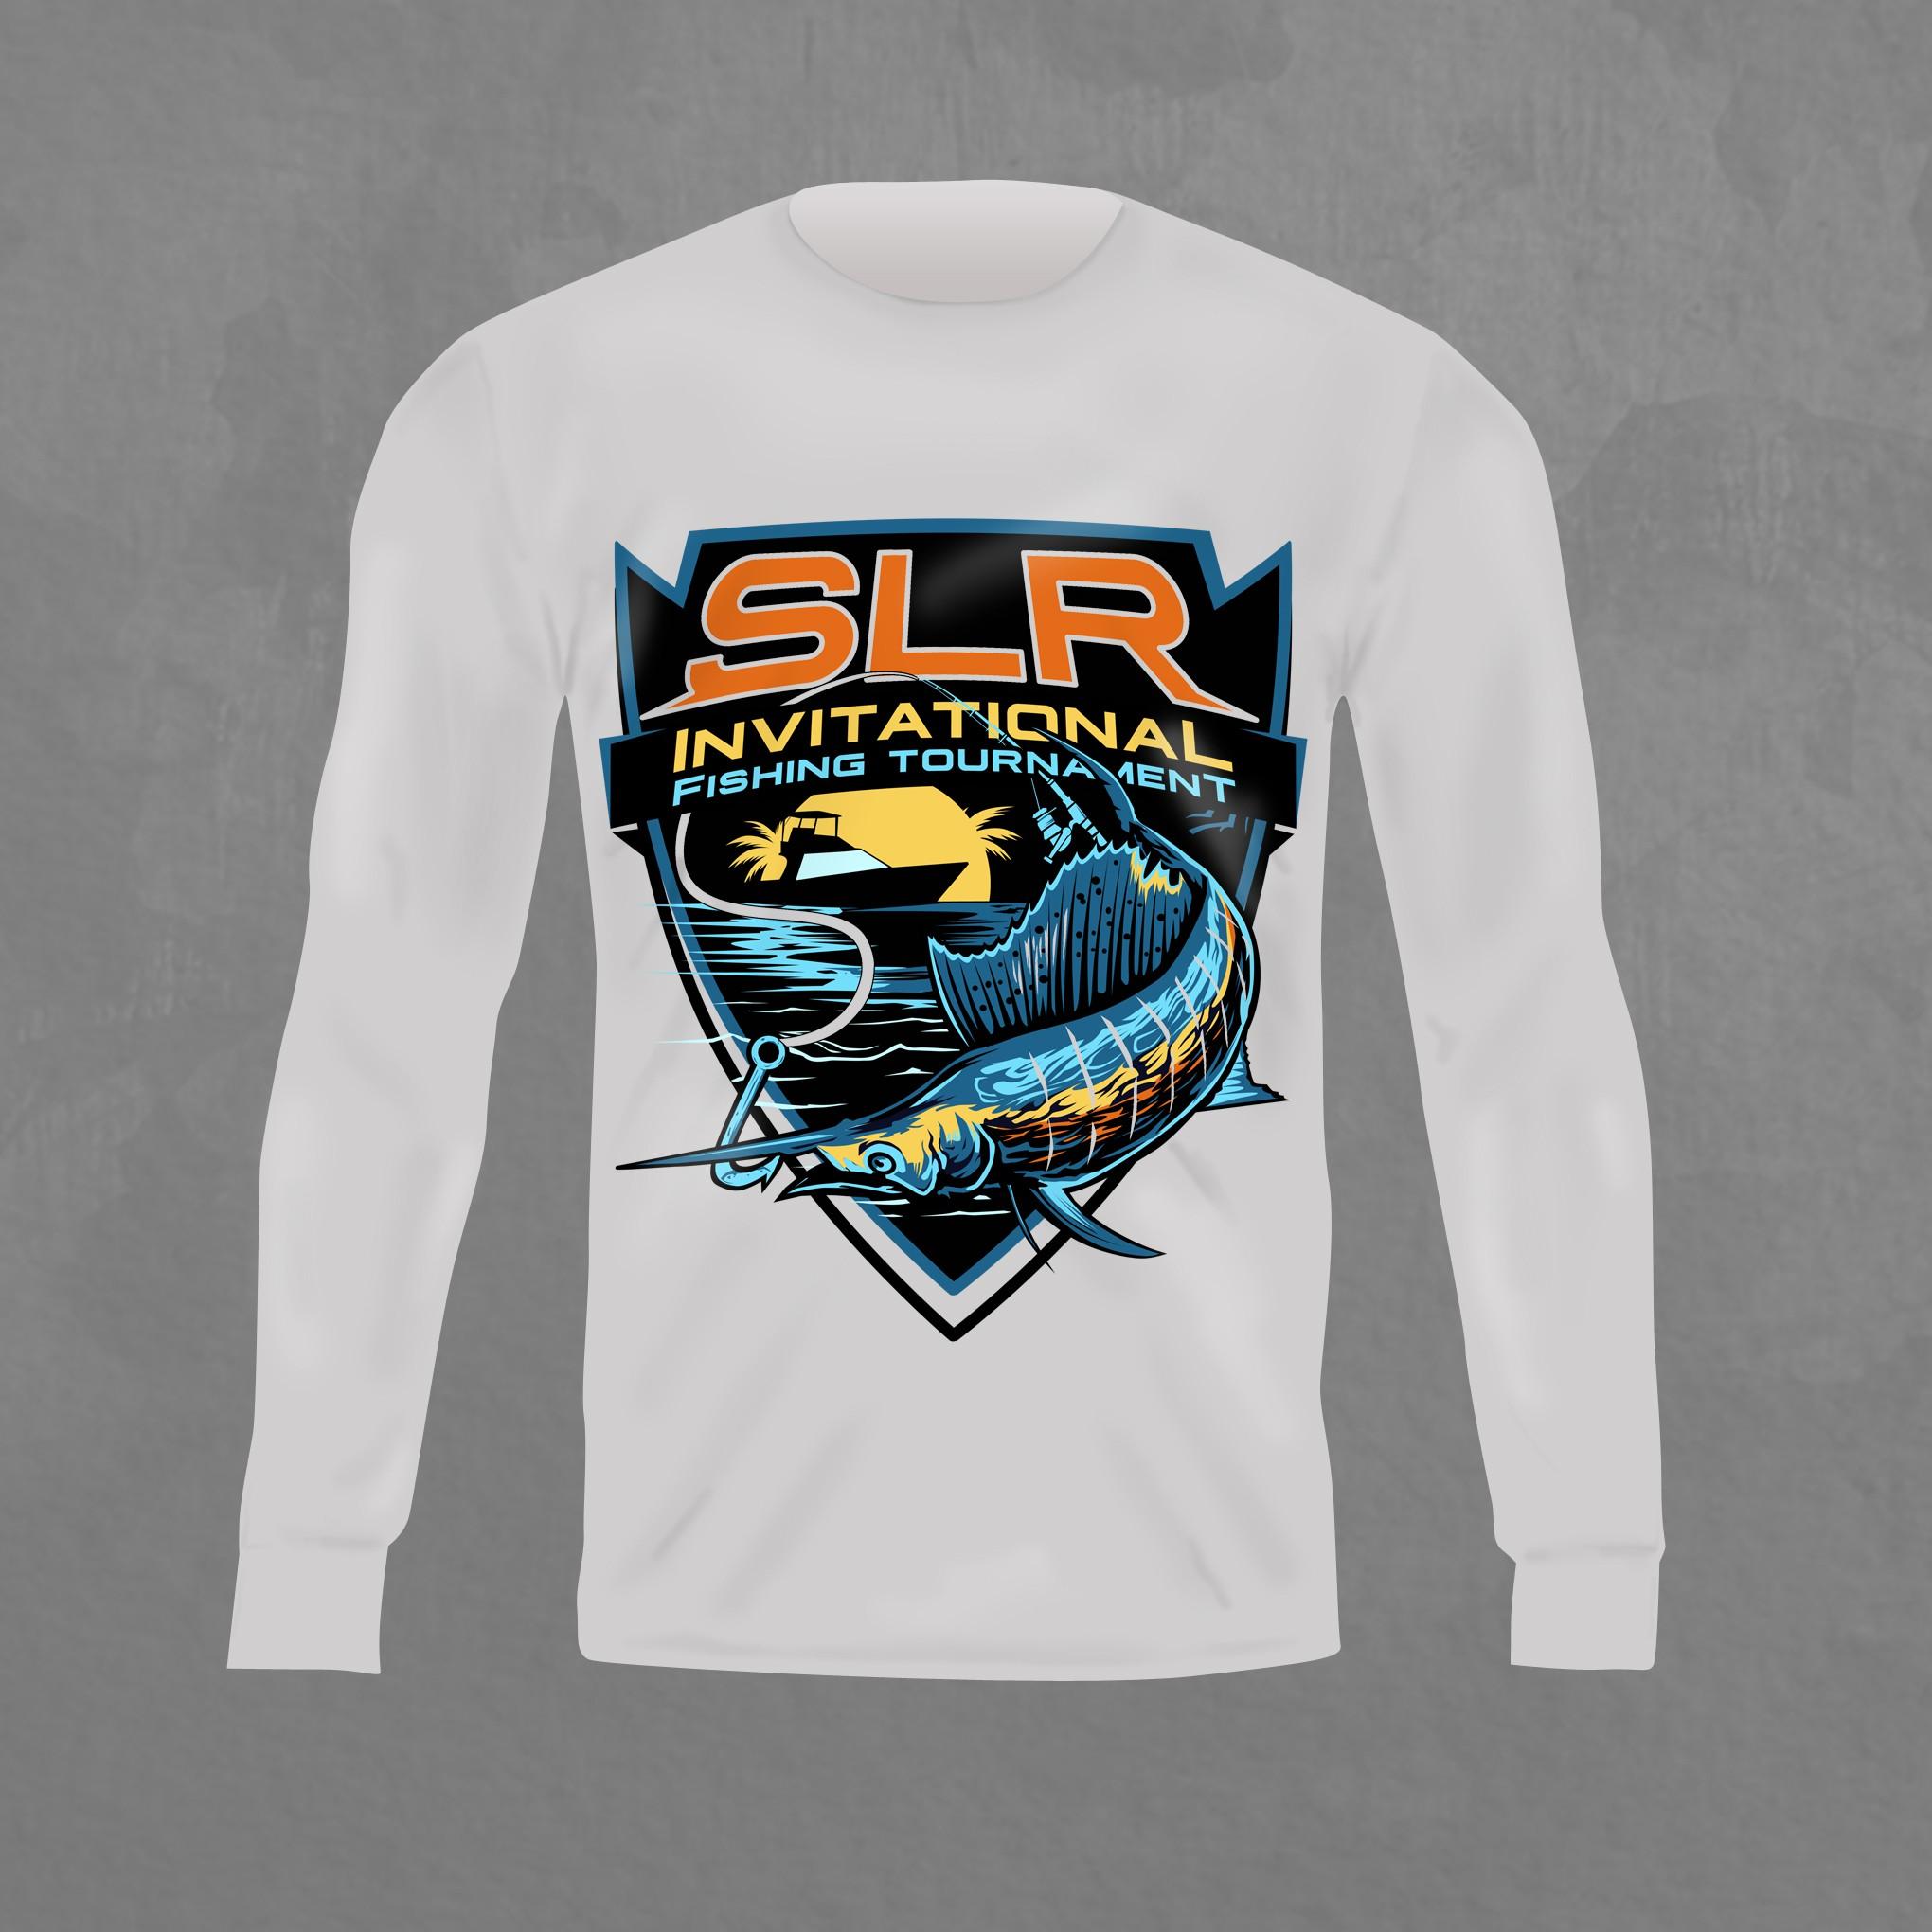 Need a Memorial Fishing Tournament t-shirt design